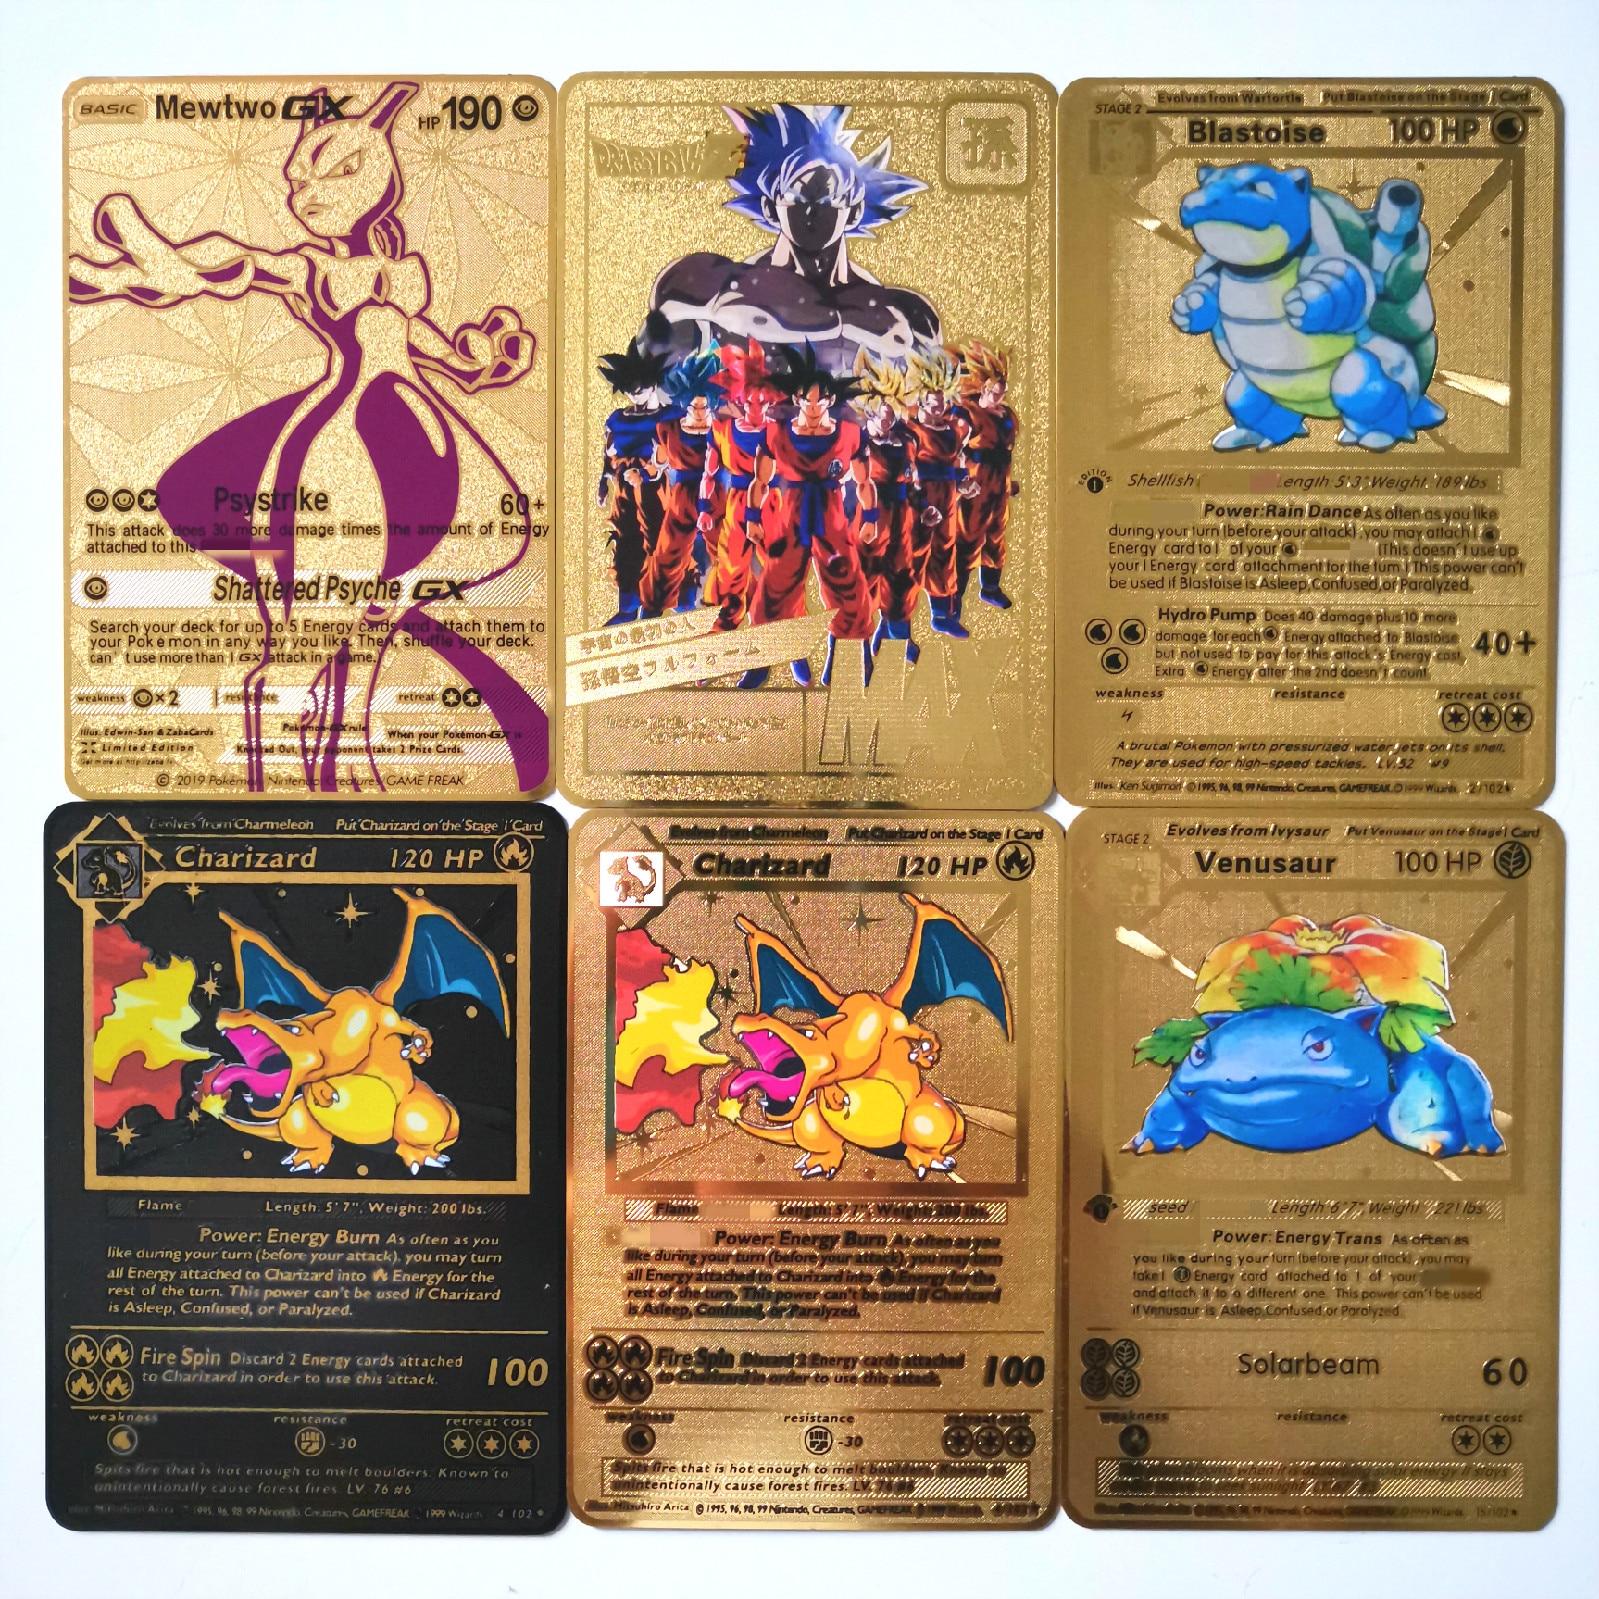 Dragon Ball Tarjeta de Metal dorada súper juego colección cartas de Anime juego niños juguete